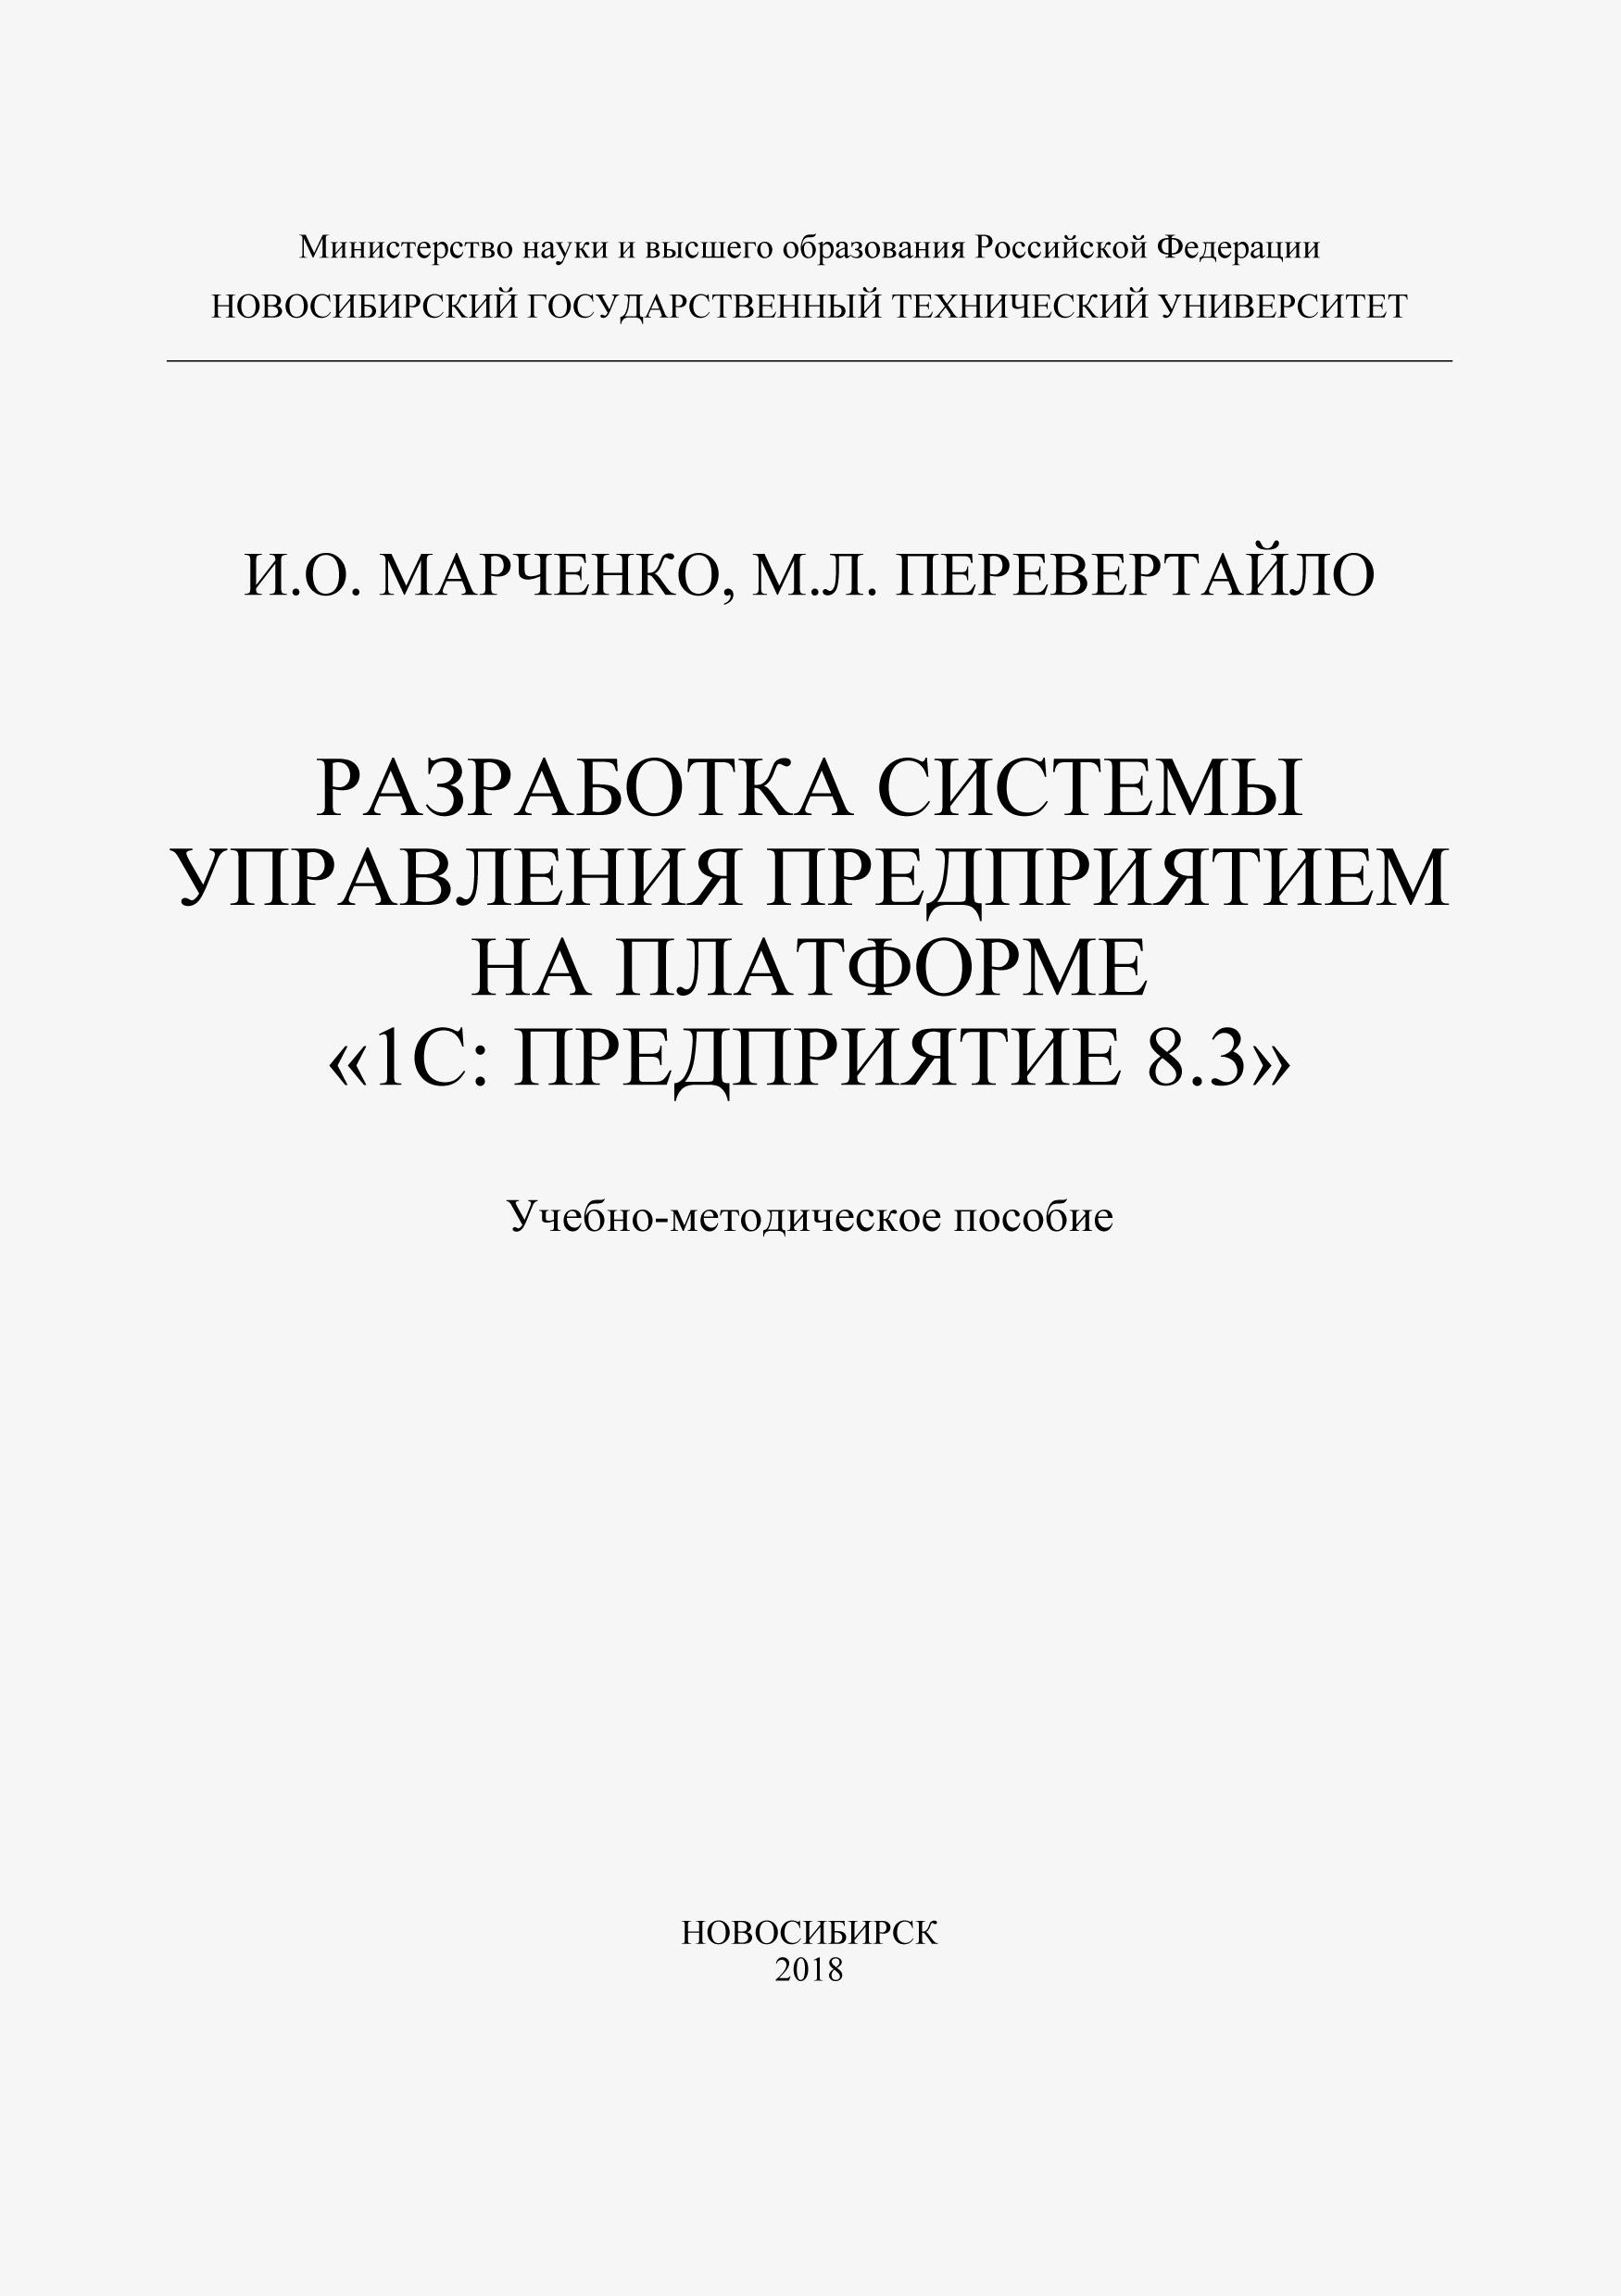 Купить книгу Разработка системы управления предприятием на платформе «1С: Предприятие 8.3», автора Марии Перевертайло